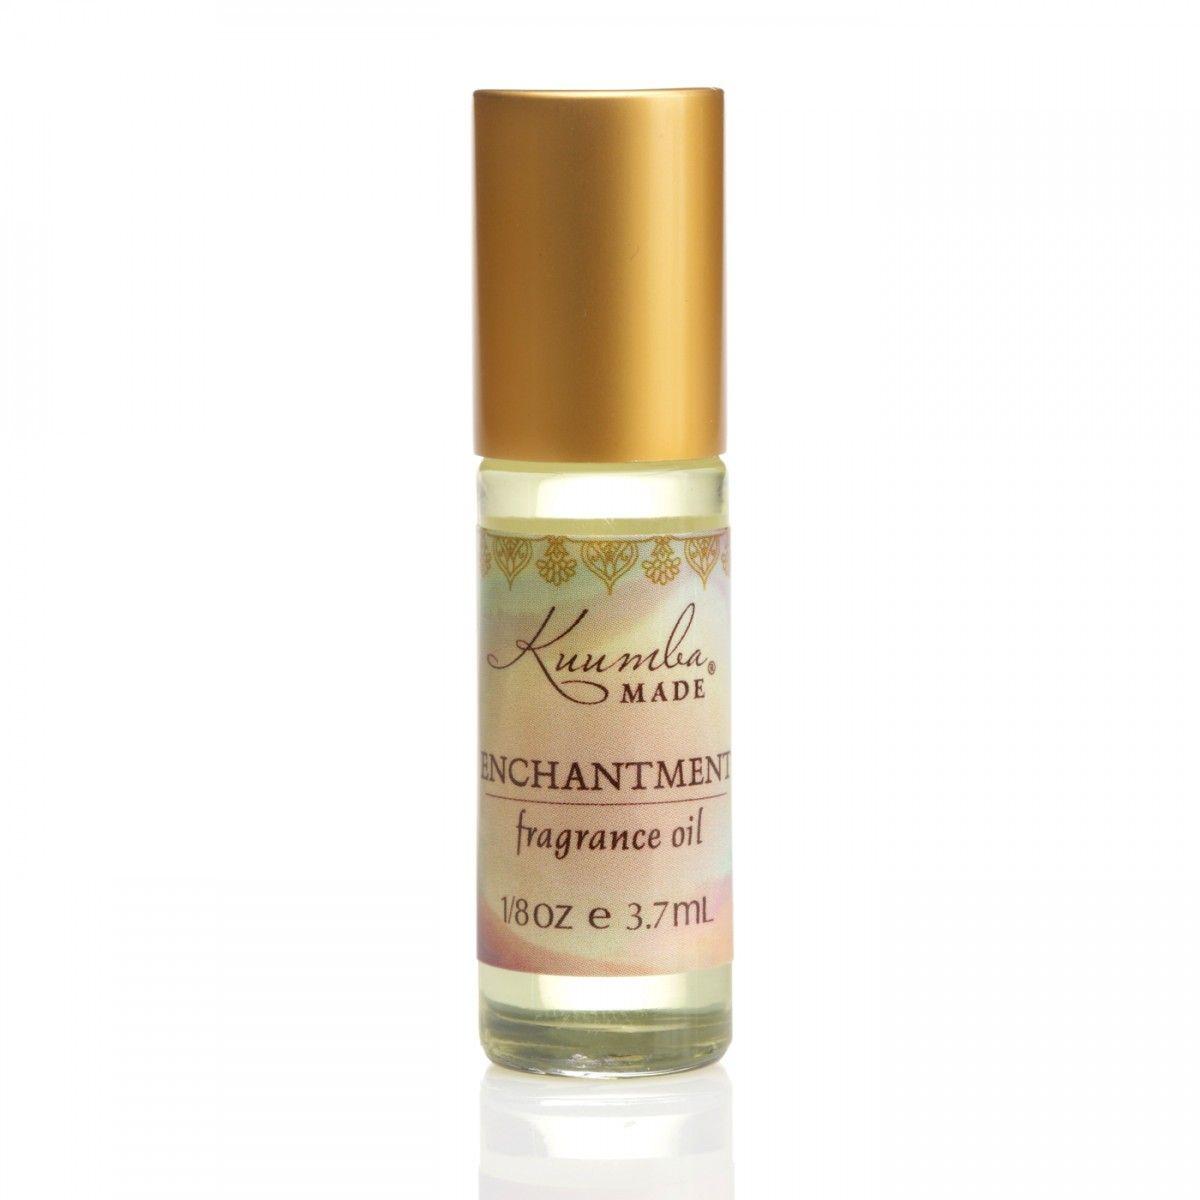 Kuumba Made Enchantment Fragrance Oil Holisticshop Co Uk Fragrance Oil Fragrance Ingredients Fragrance